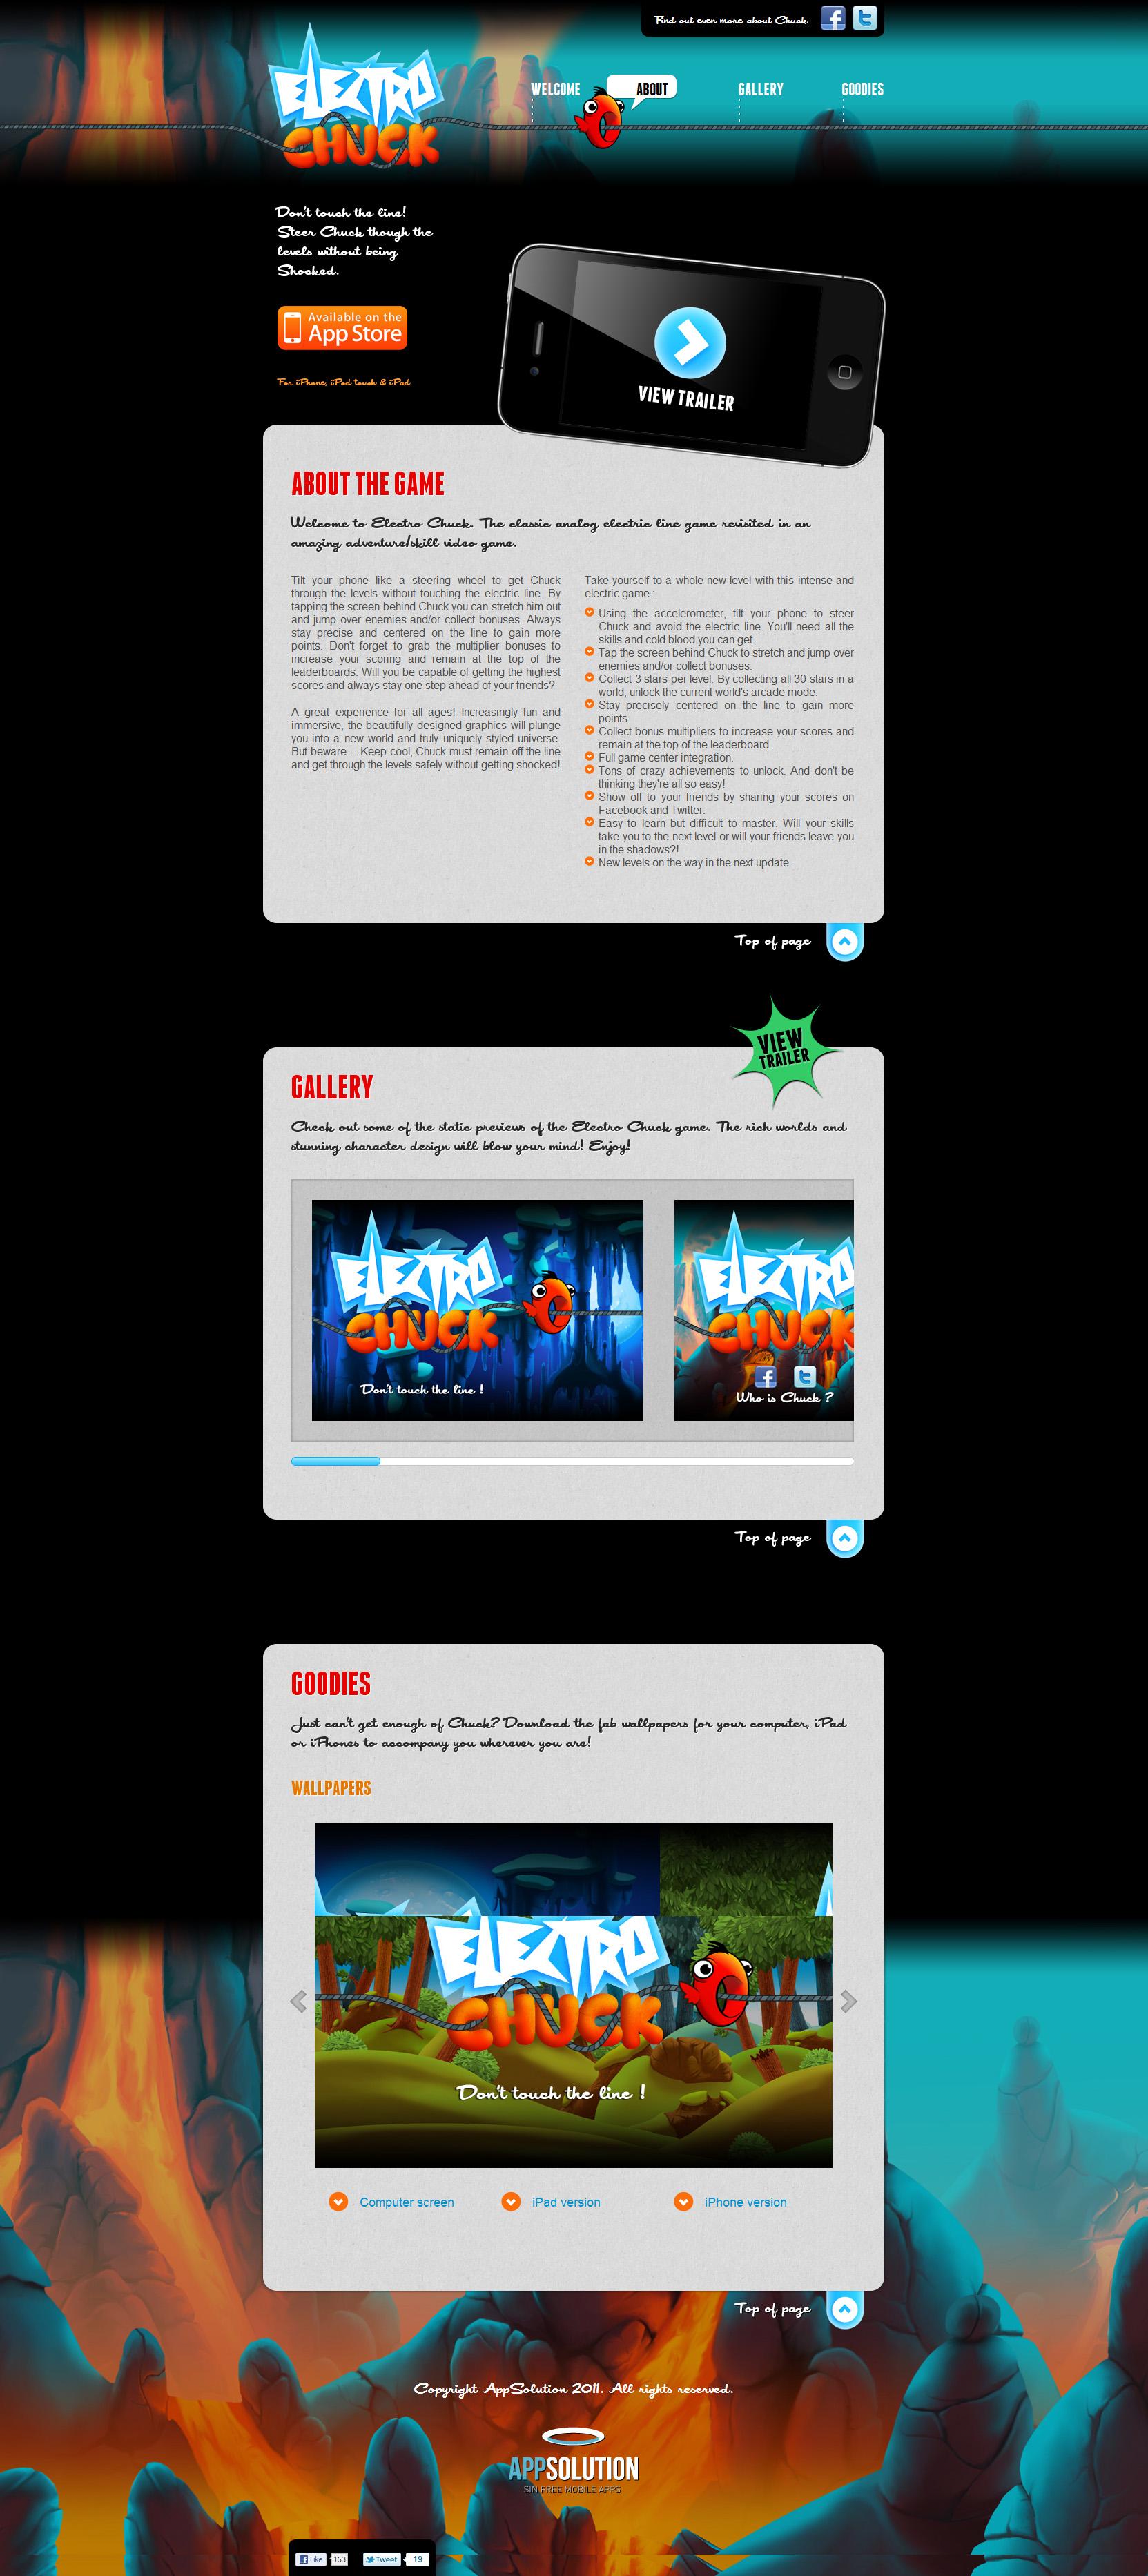 Electro Chuck Website Screenshot